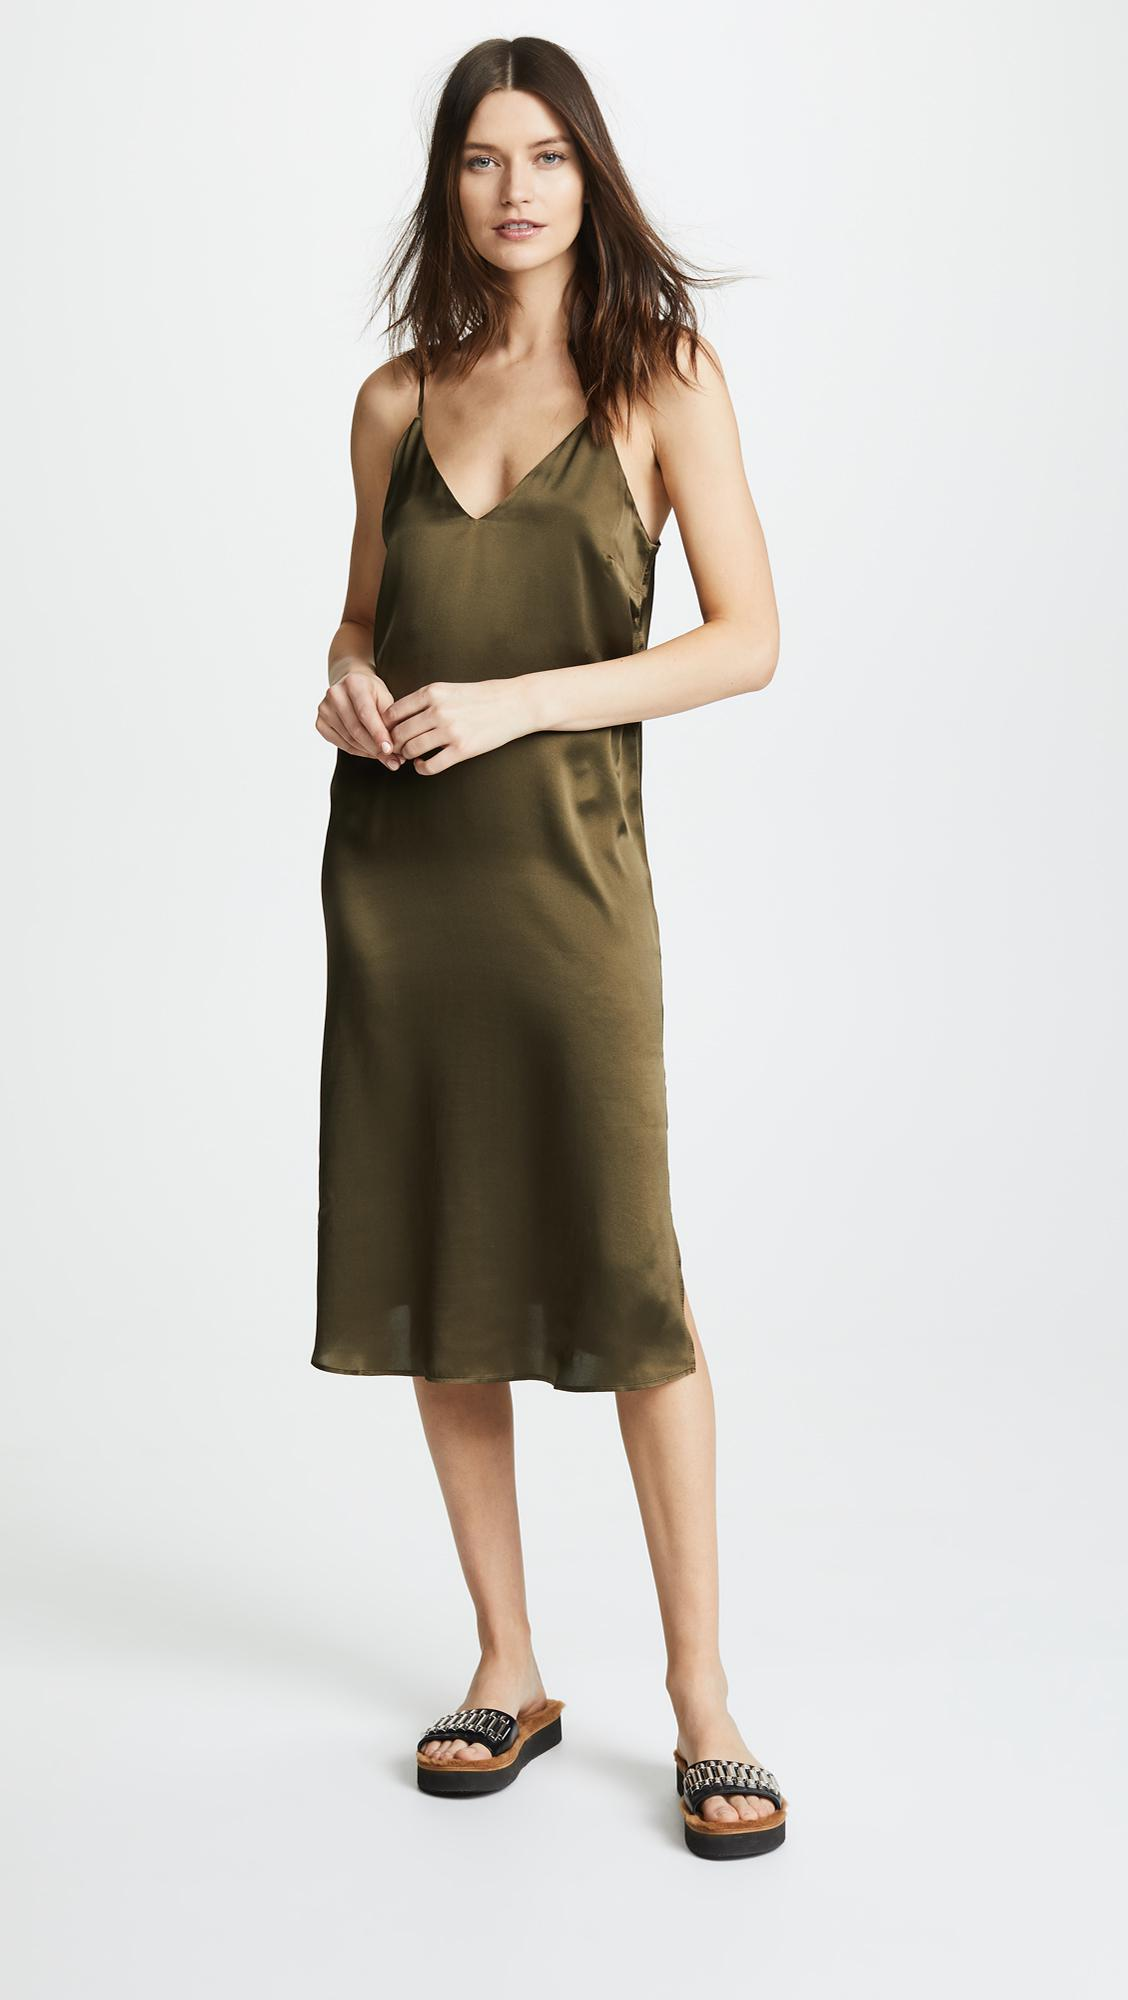 ce0b3760eb74 Anine Bing Gemma Slip Dress in Green - Lyst